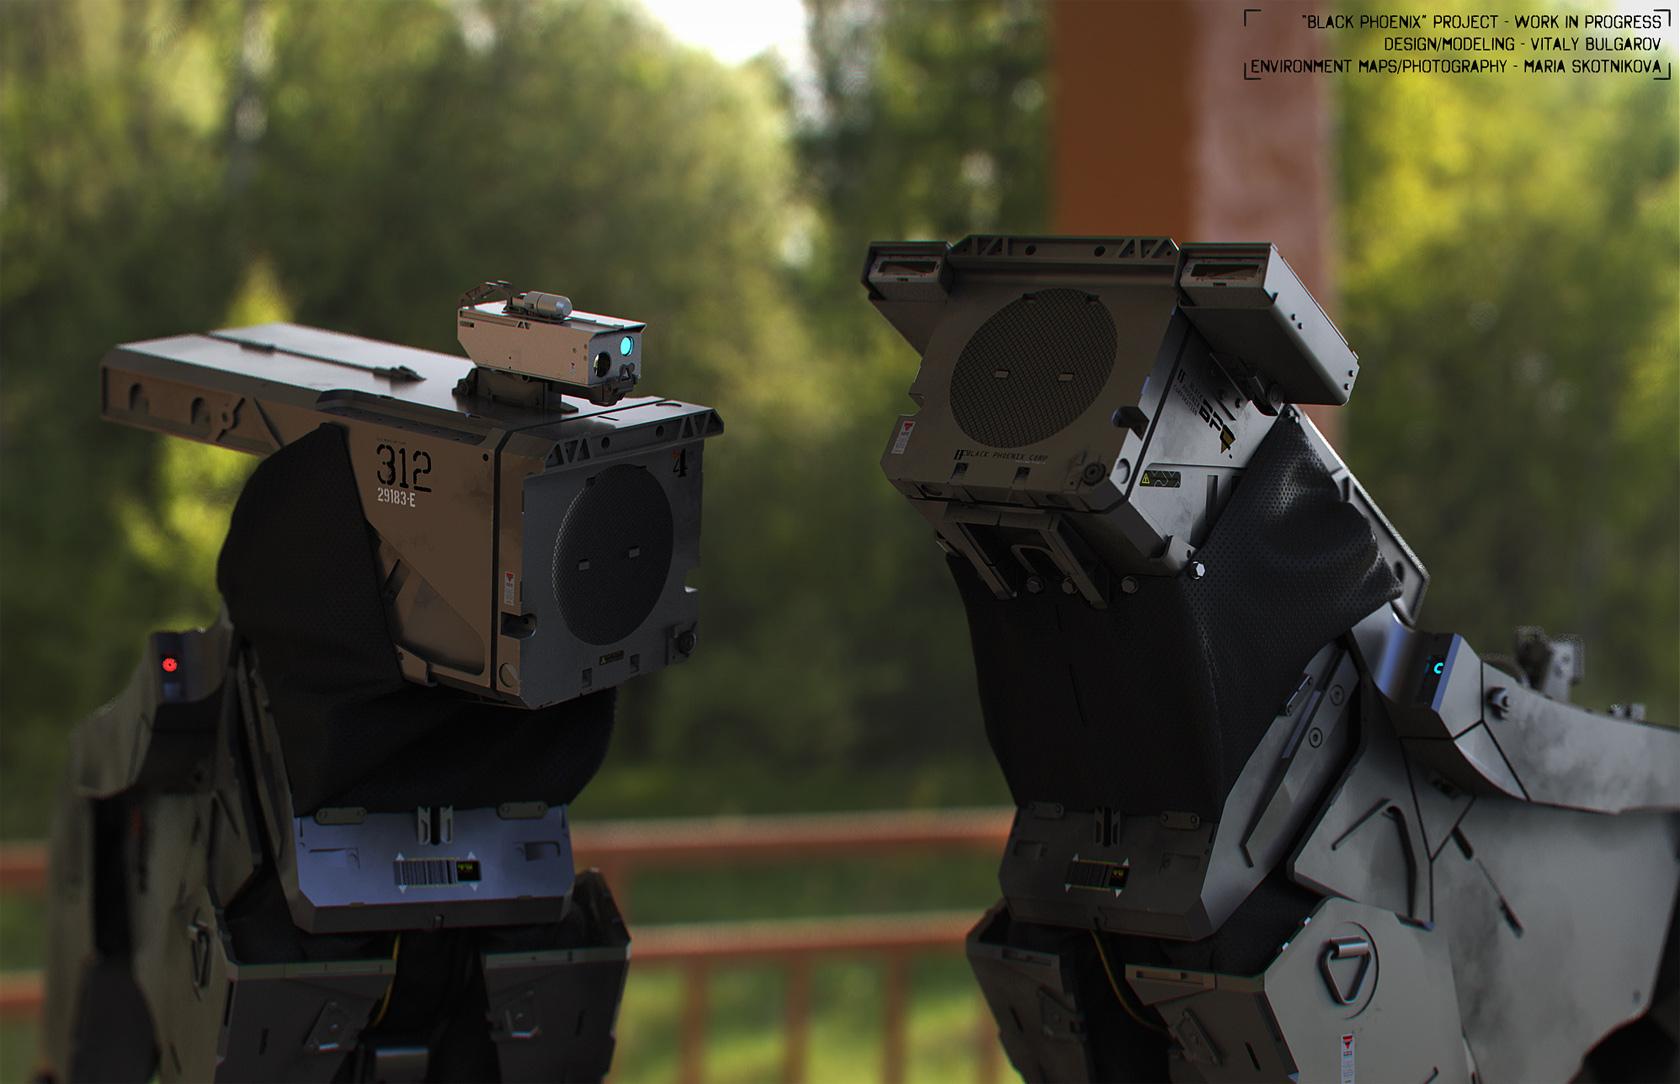 scoutdogs_vbulgarov_blog.jpg